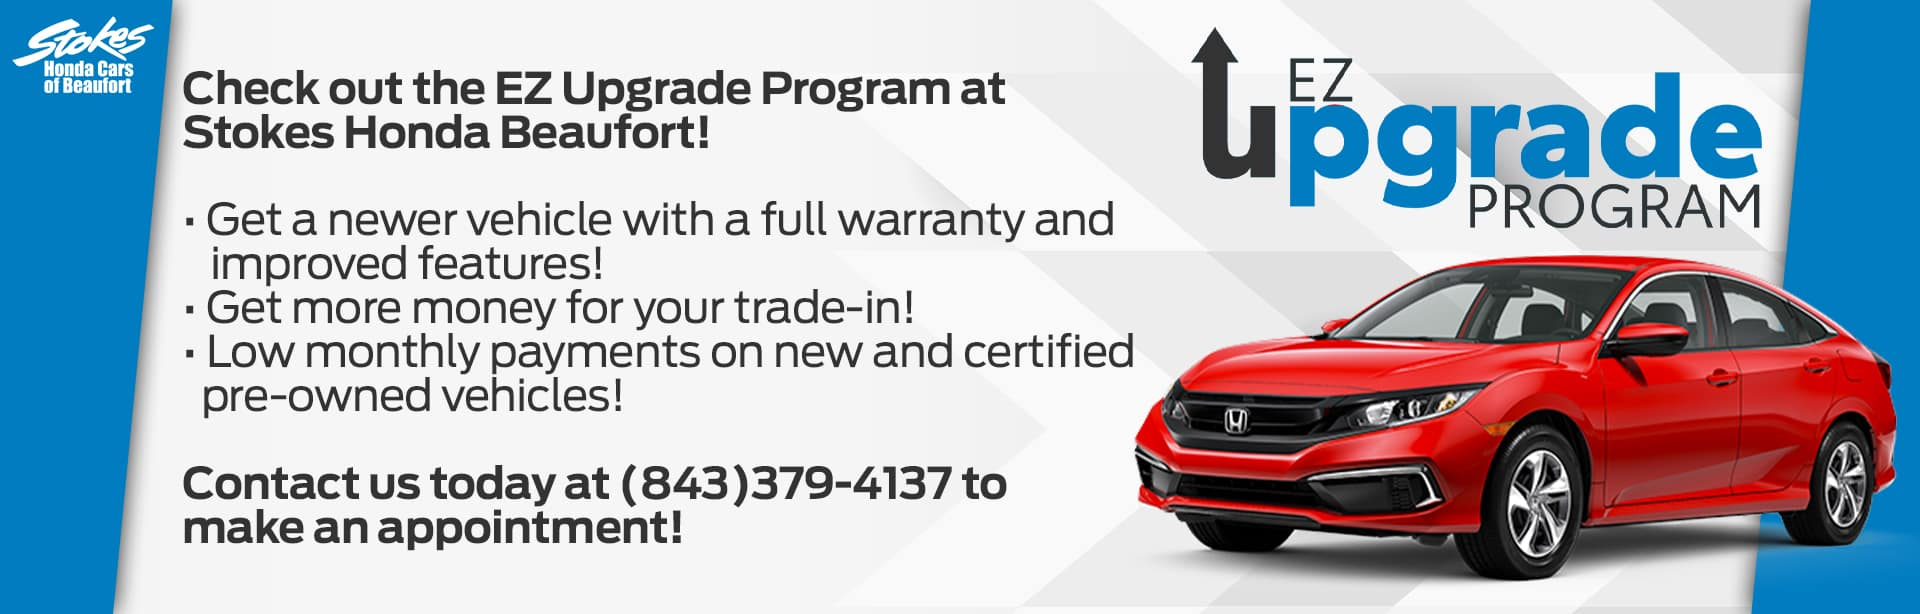 EZ Upgrade Program at Stokes Honda Cars of Beaufort